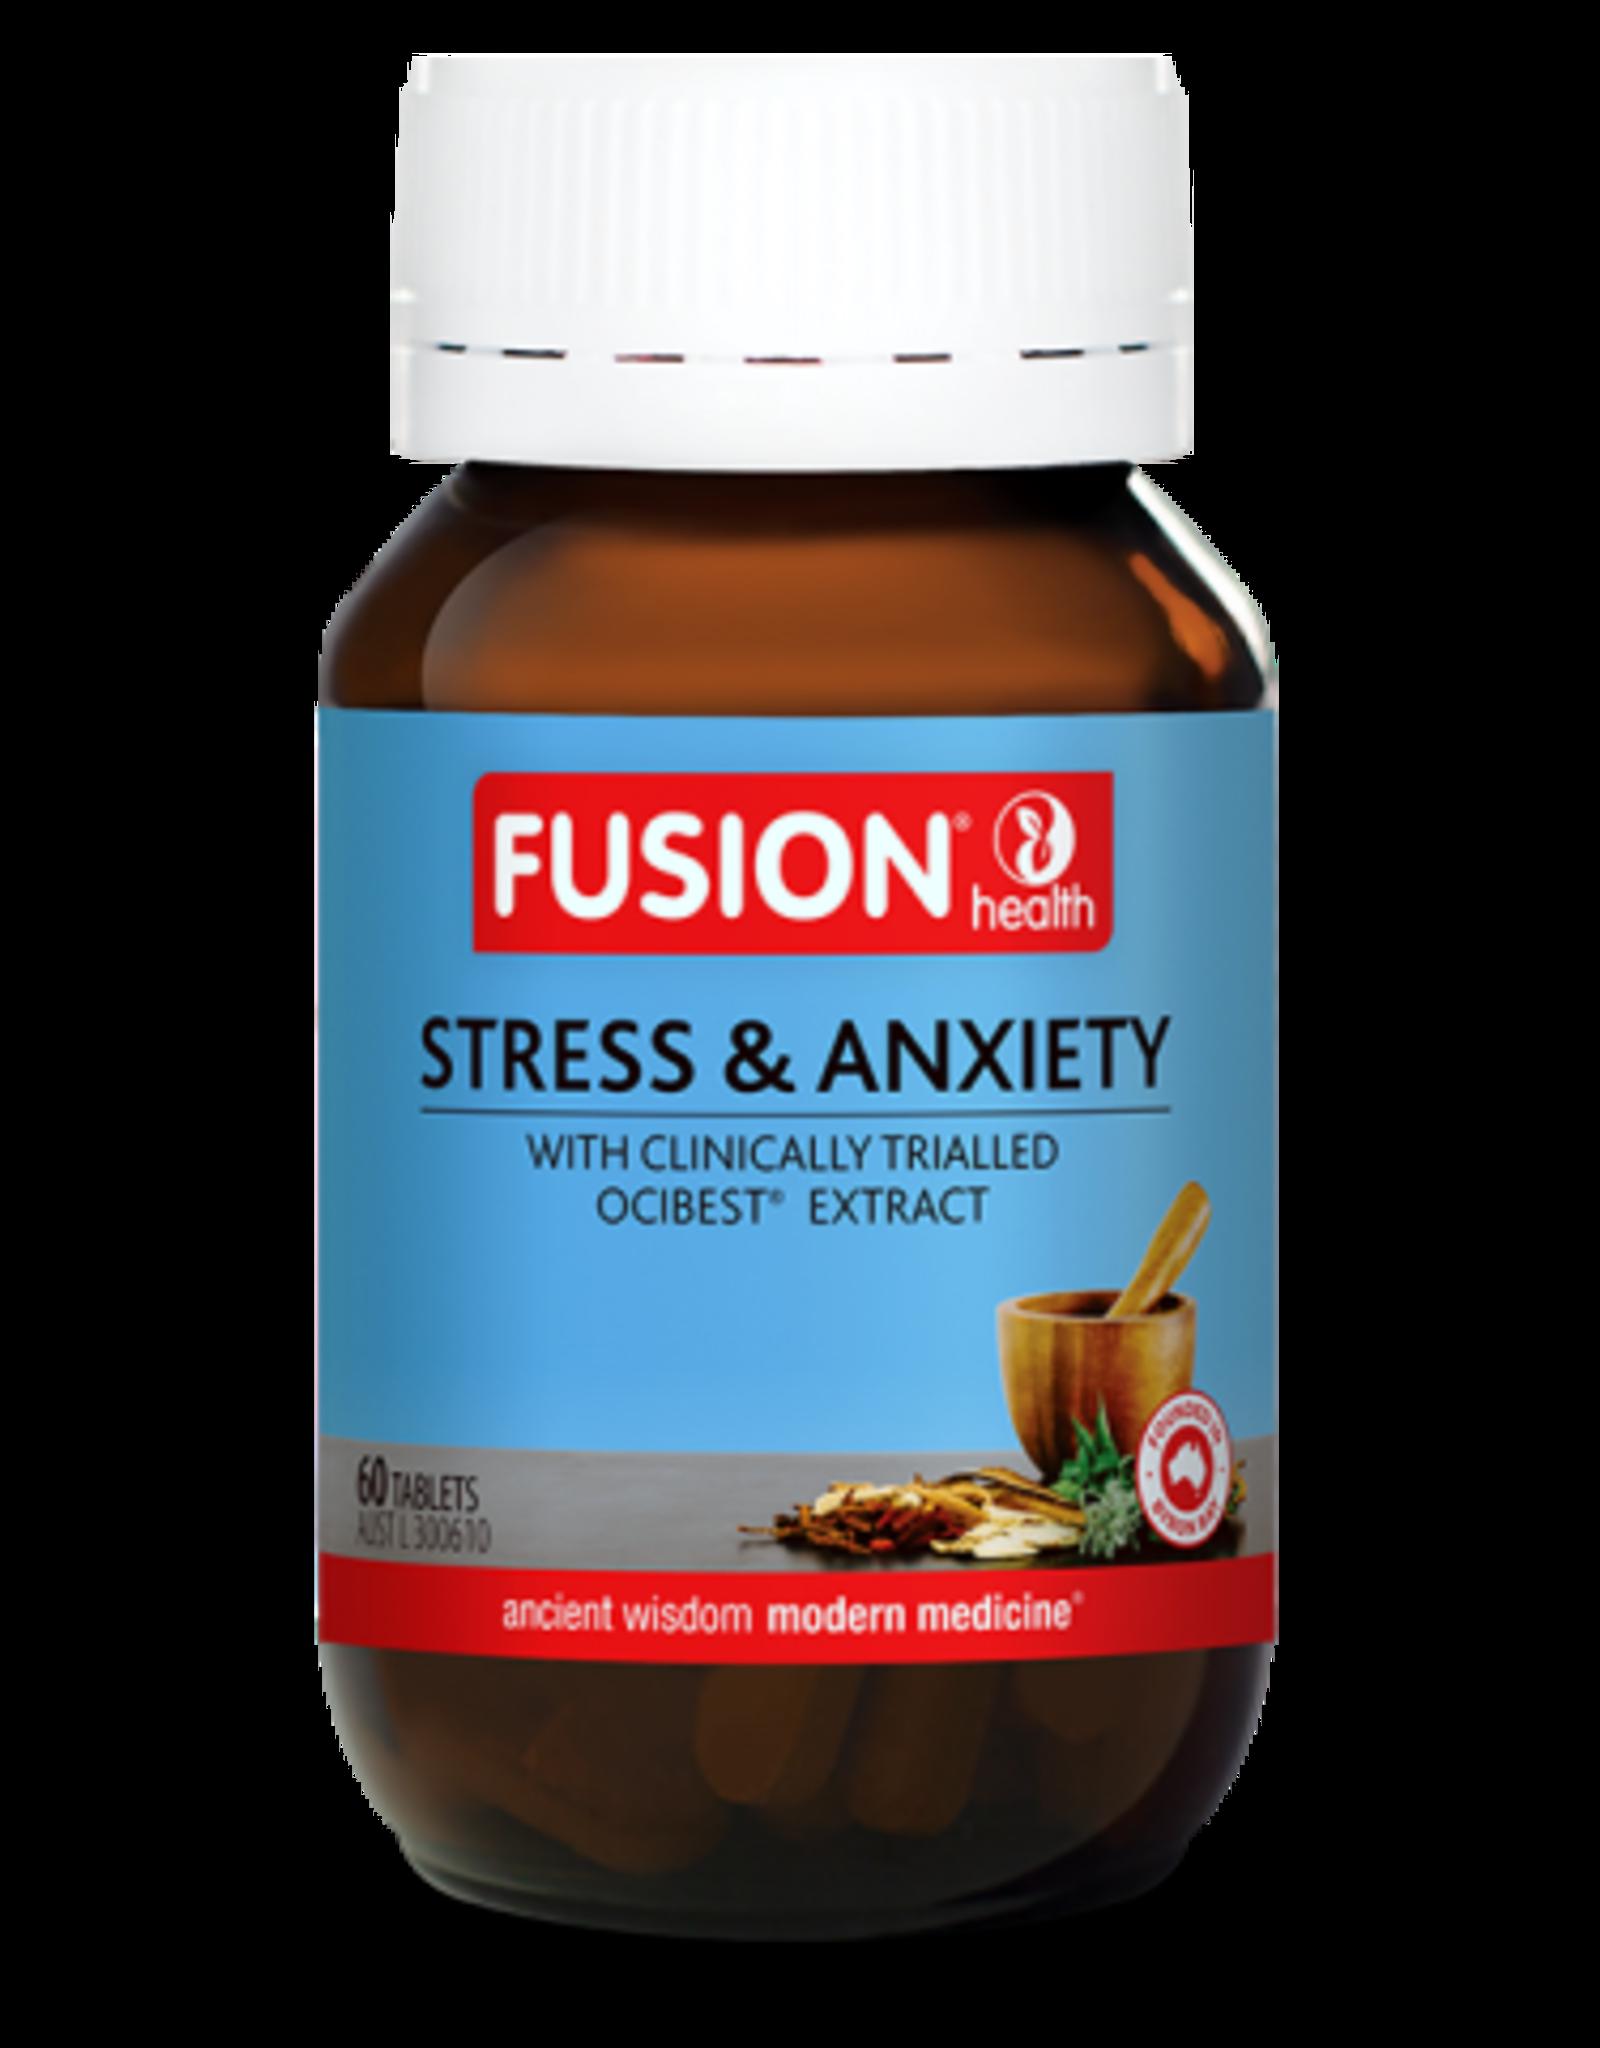 Fusion Stress & Anxiety